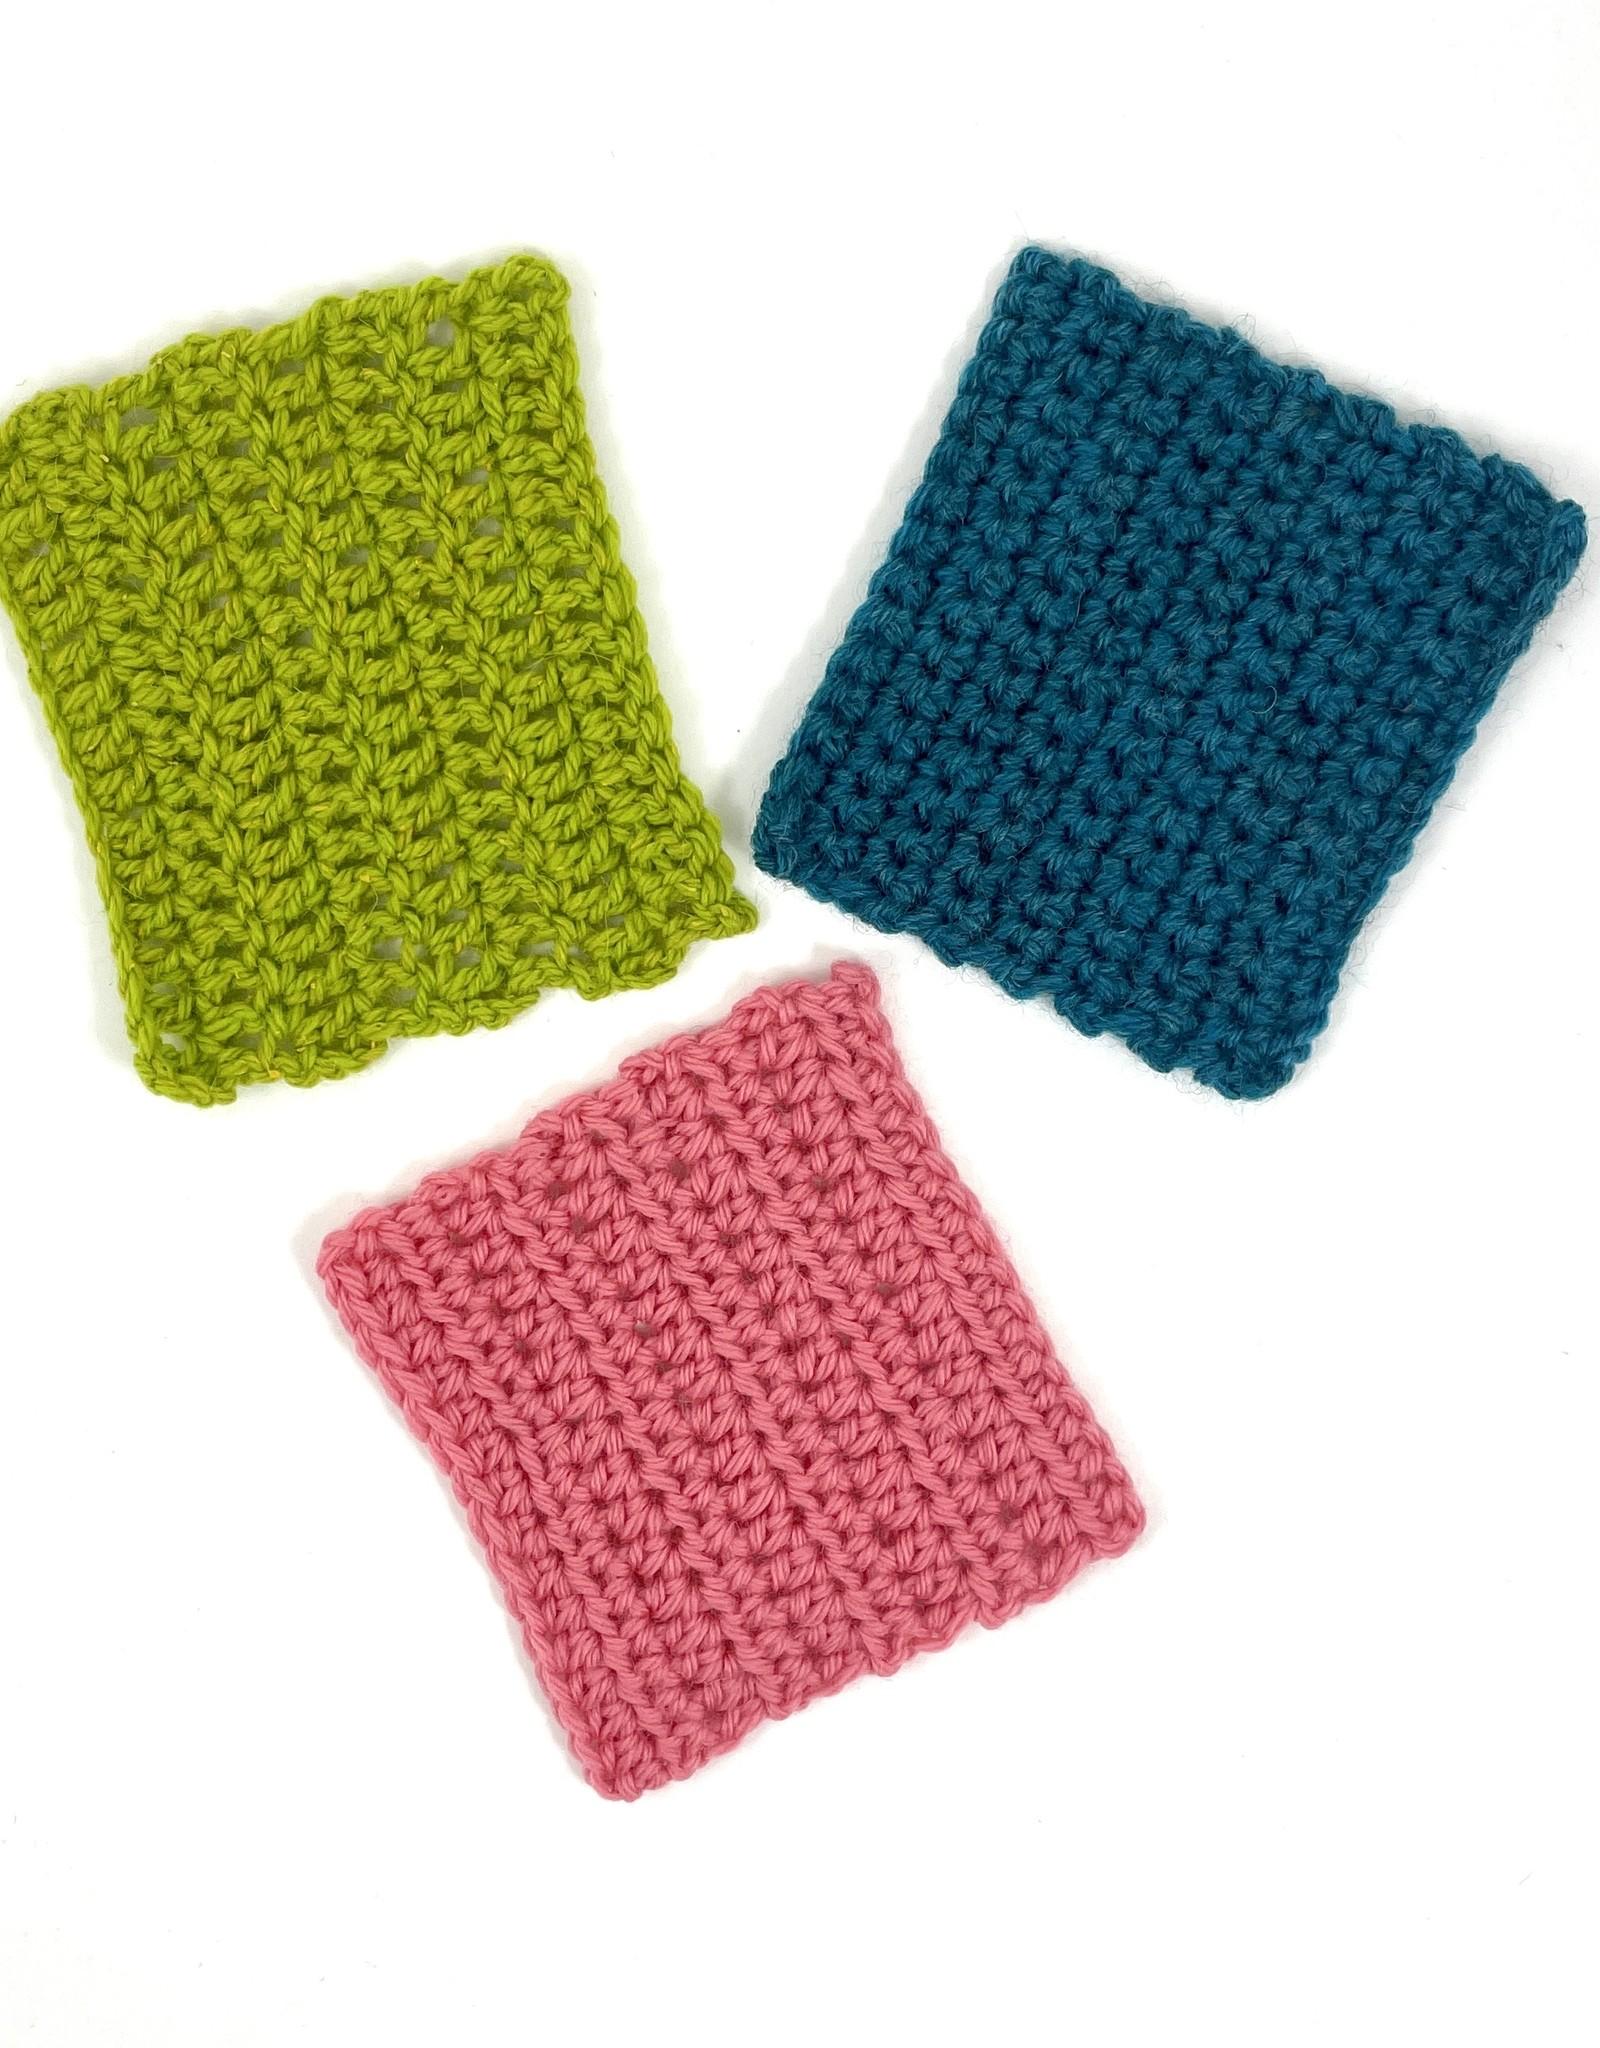 Basic Crochet Part 1- Learn to Crochet